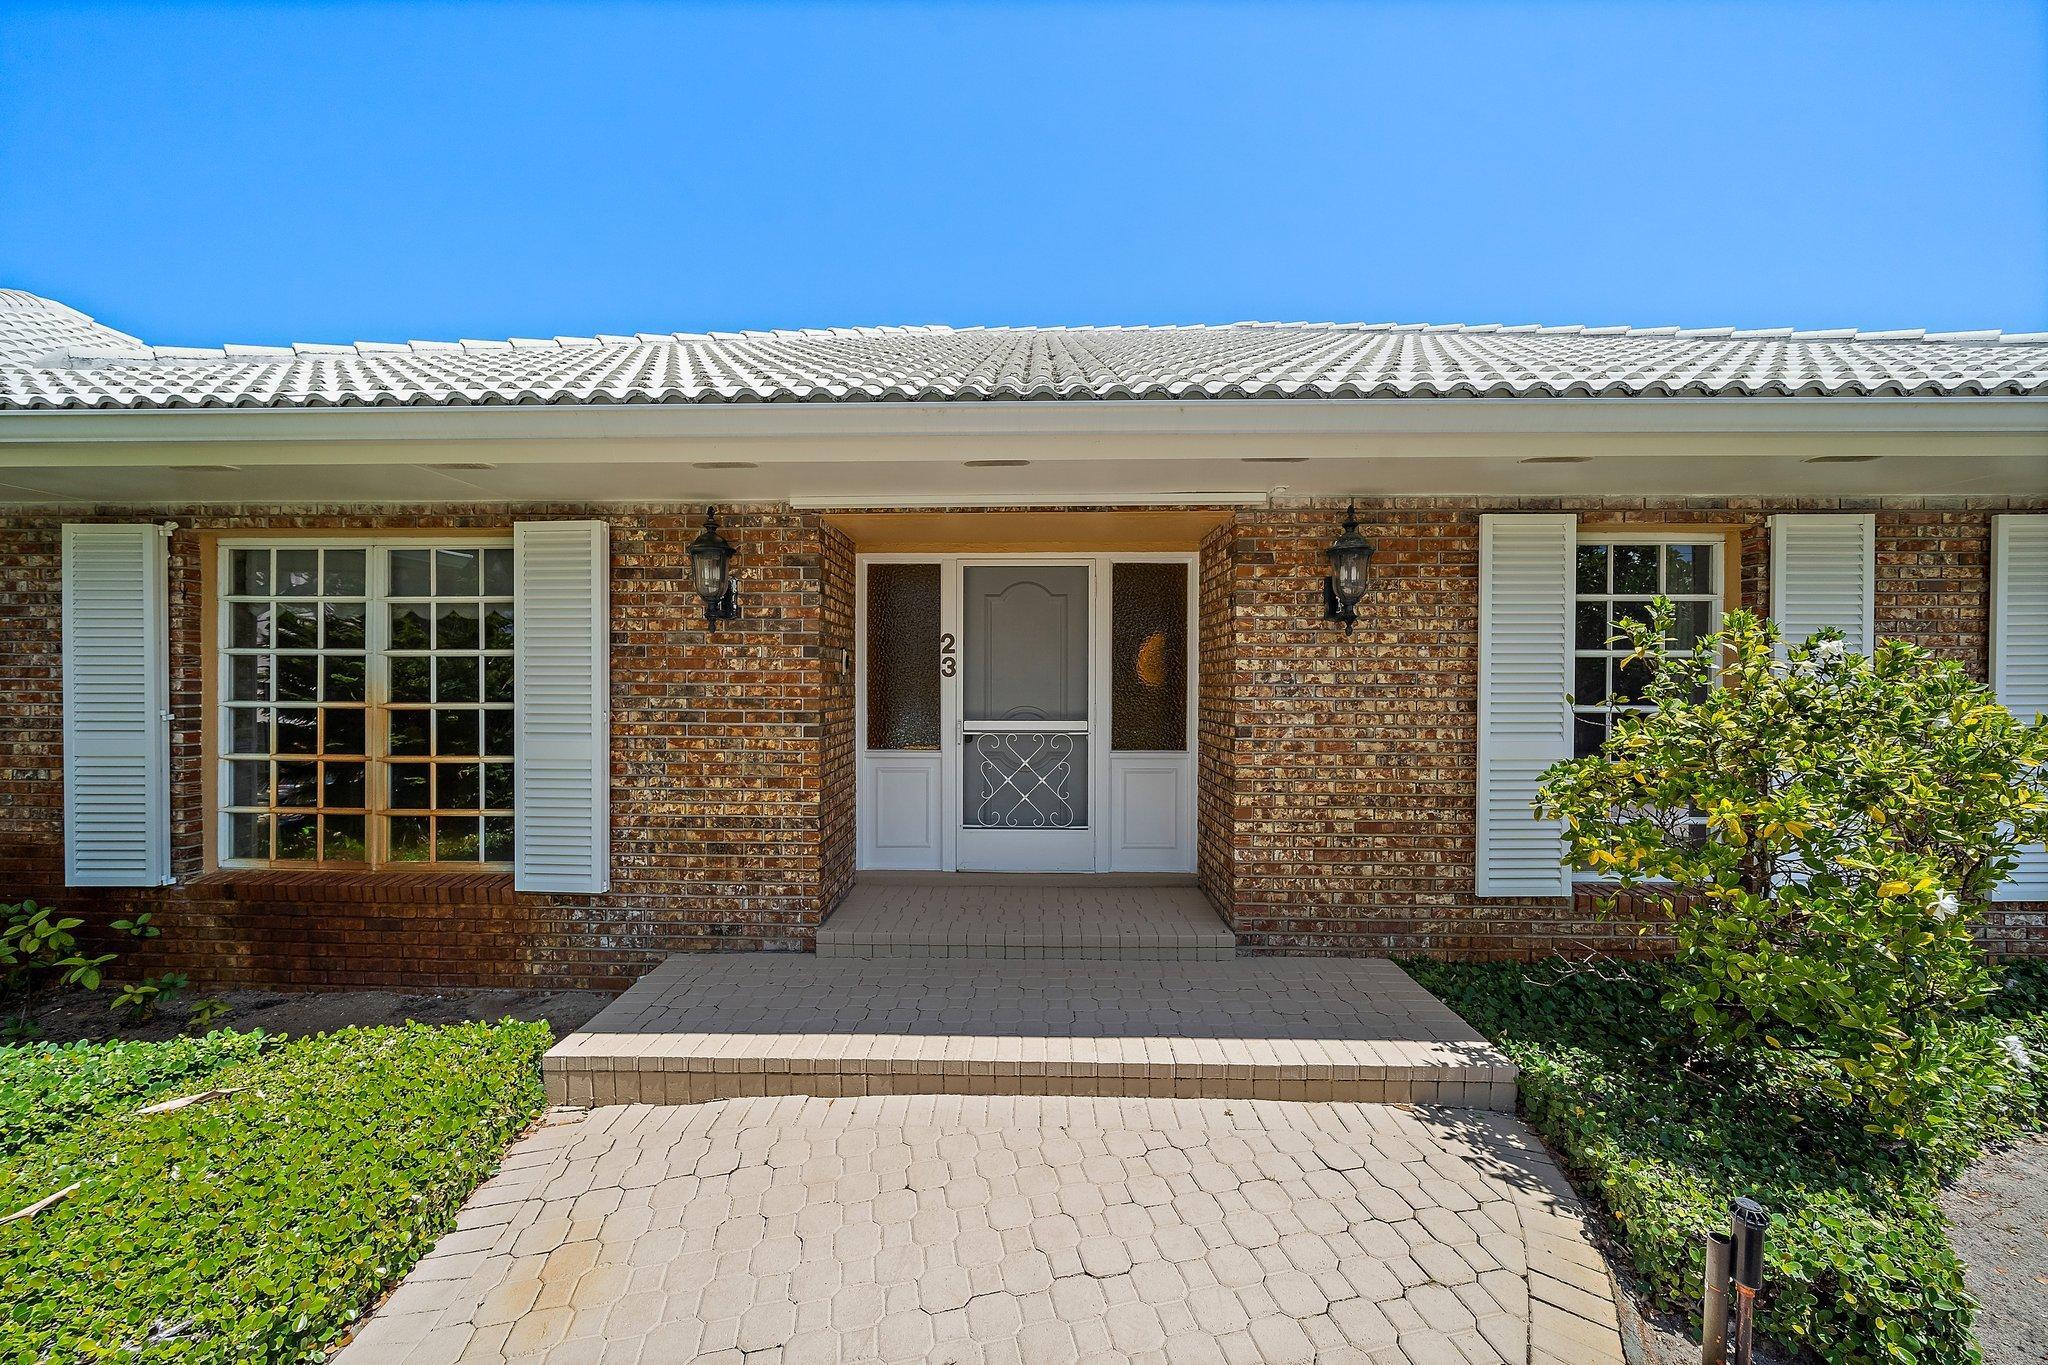 23 Country Club, Tequesta, Florida 33469